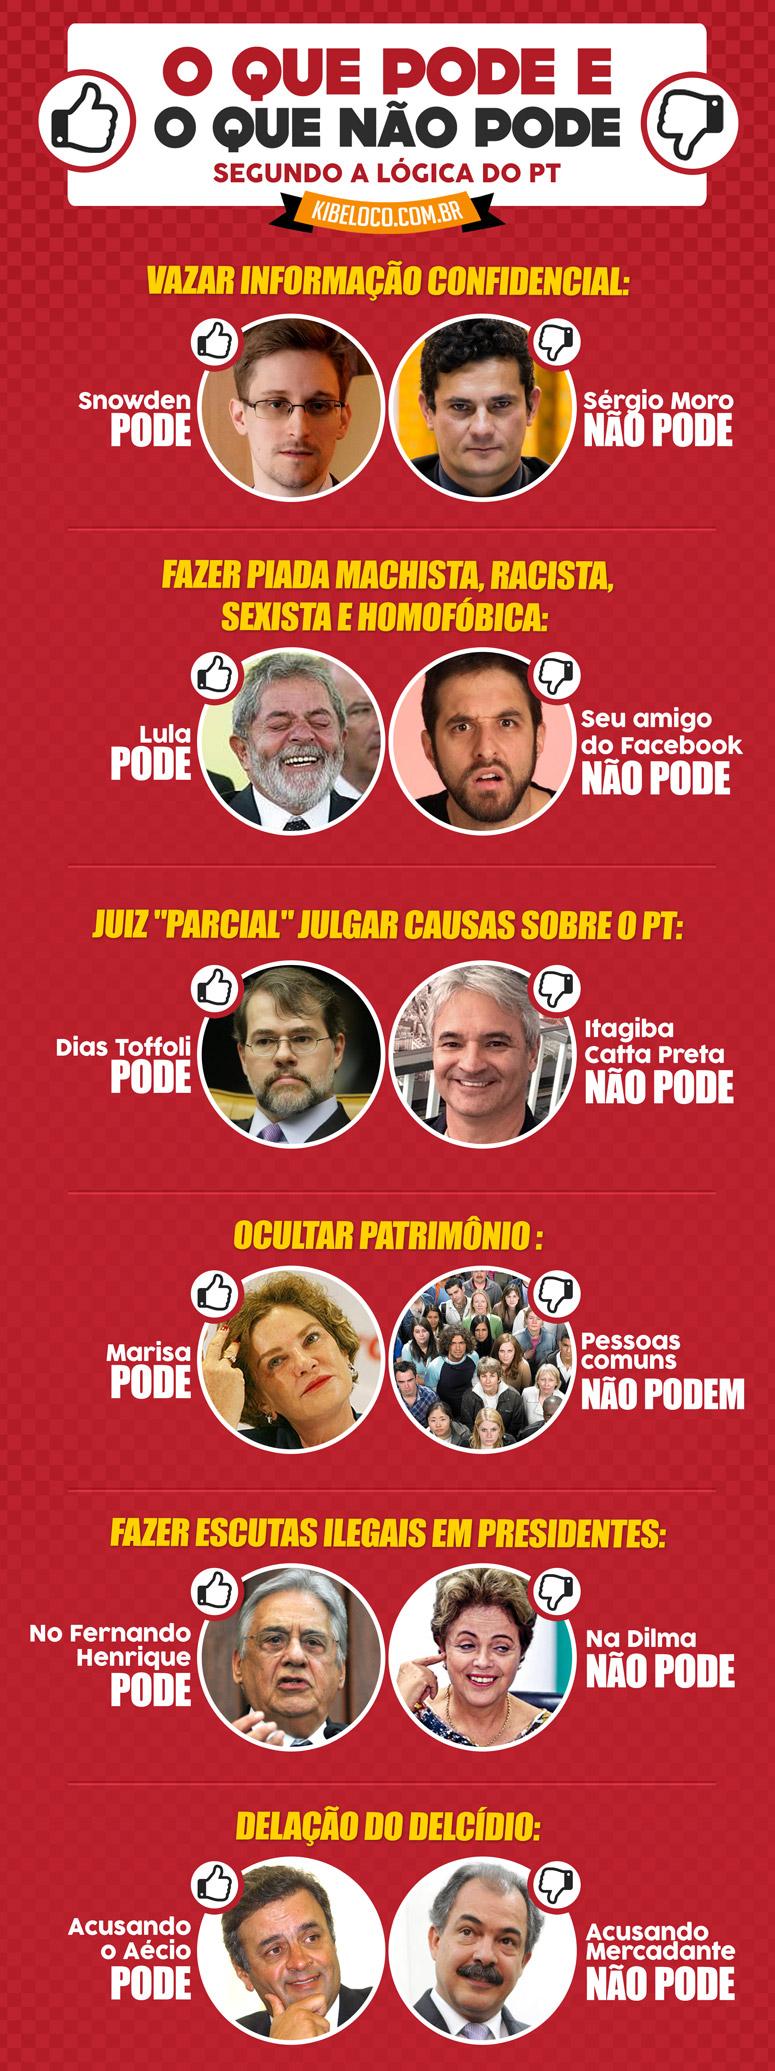 Lula aceita convite de Dilma e assumirá Casa Civil - Página 5 PODE-N%C3%83O-PODE-PARA-PT